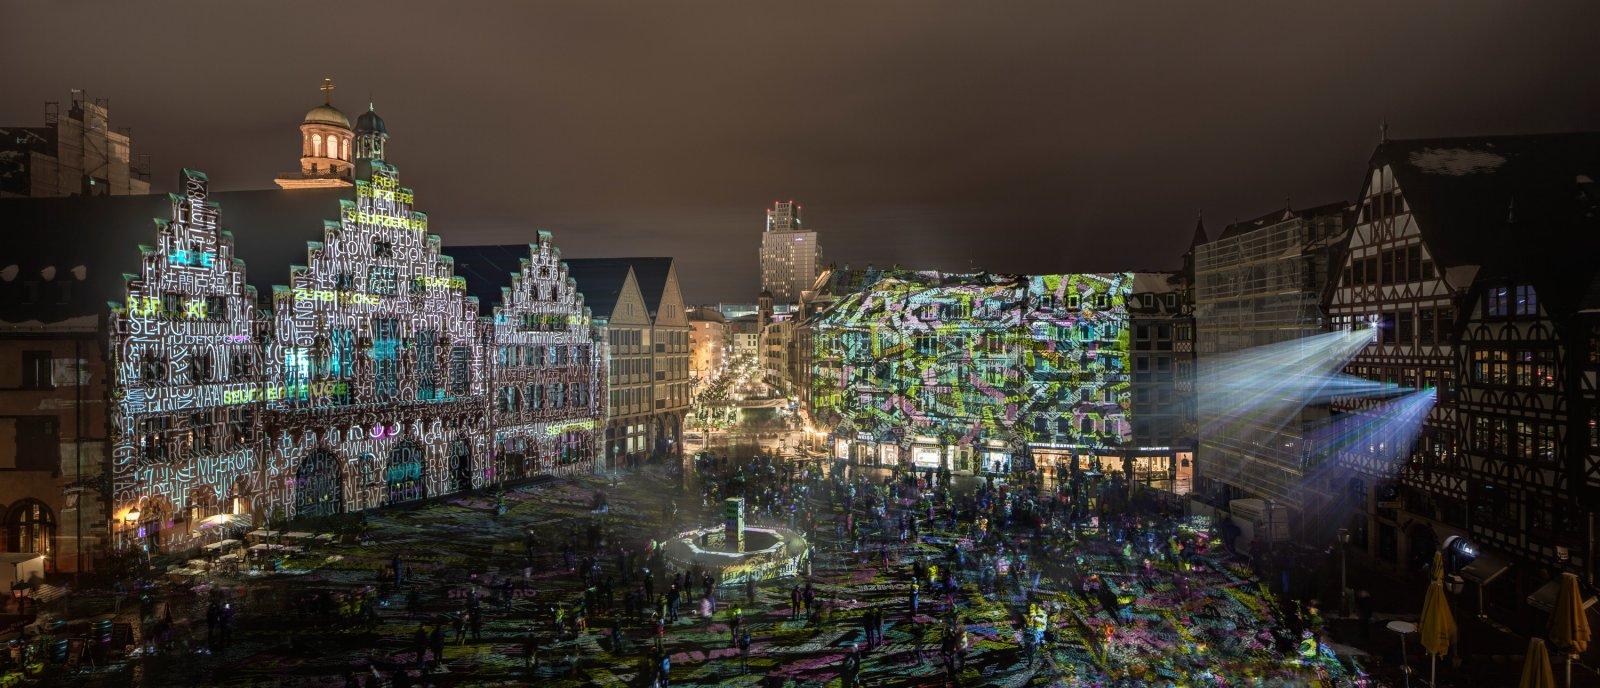 luminale frankfurt square